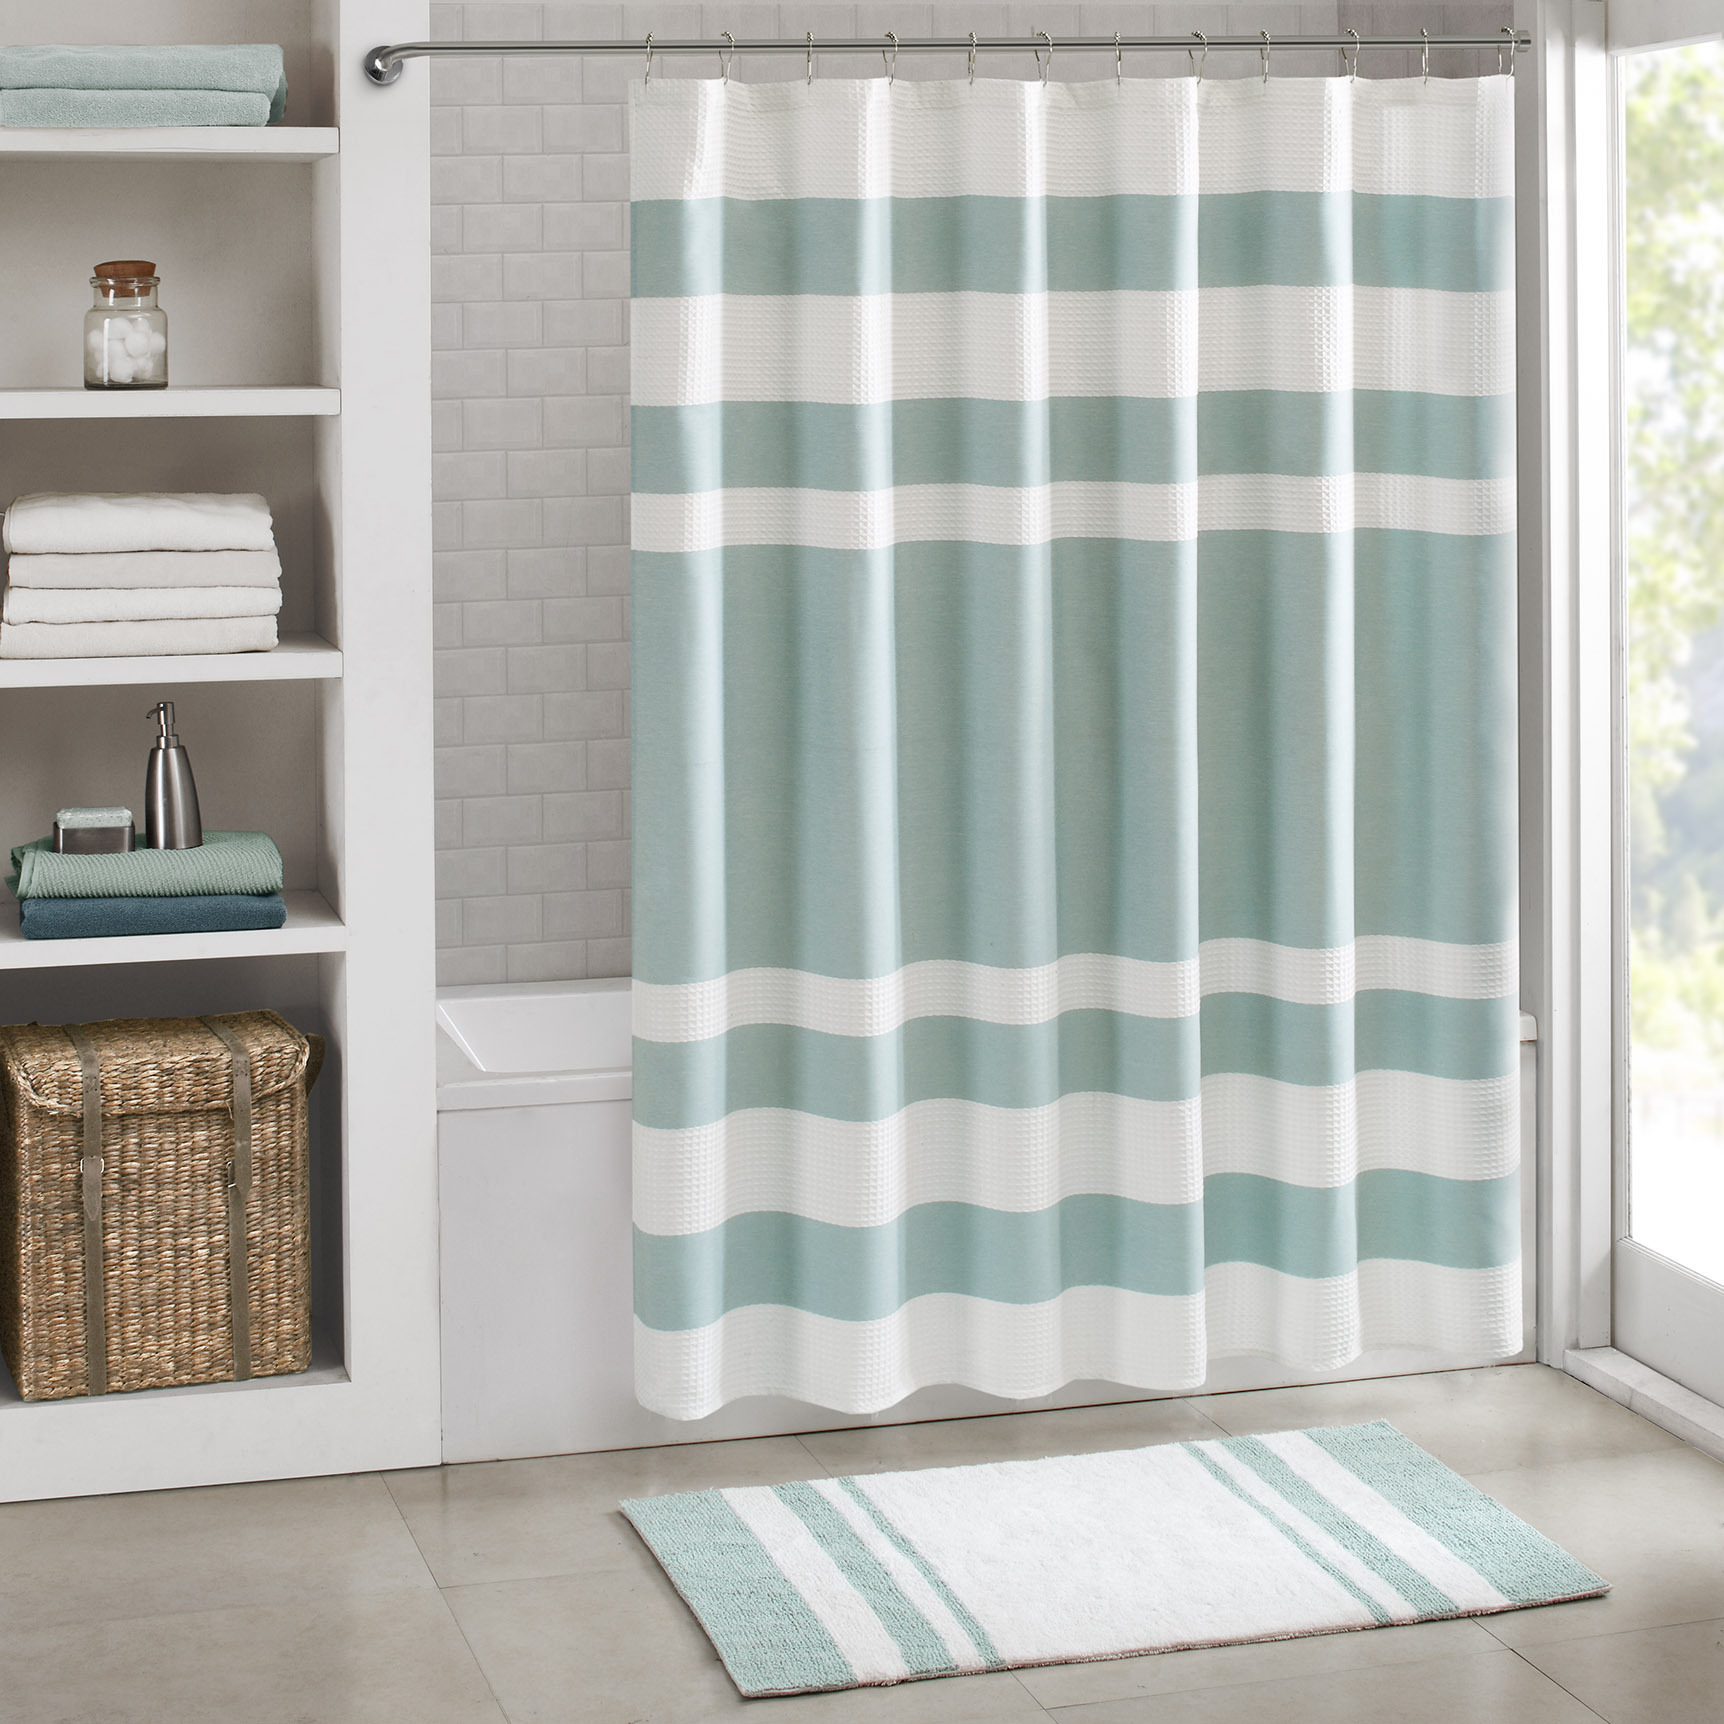 Whale shower curtain - Madison Park Spa Waffle Shower Curtain Whale Shower Curtain